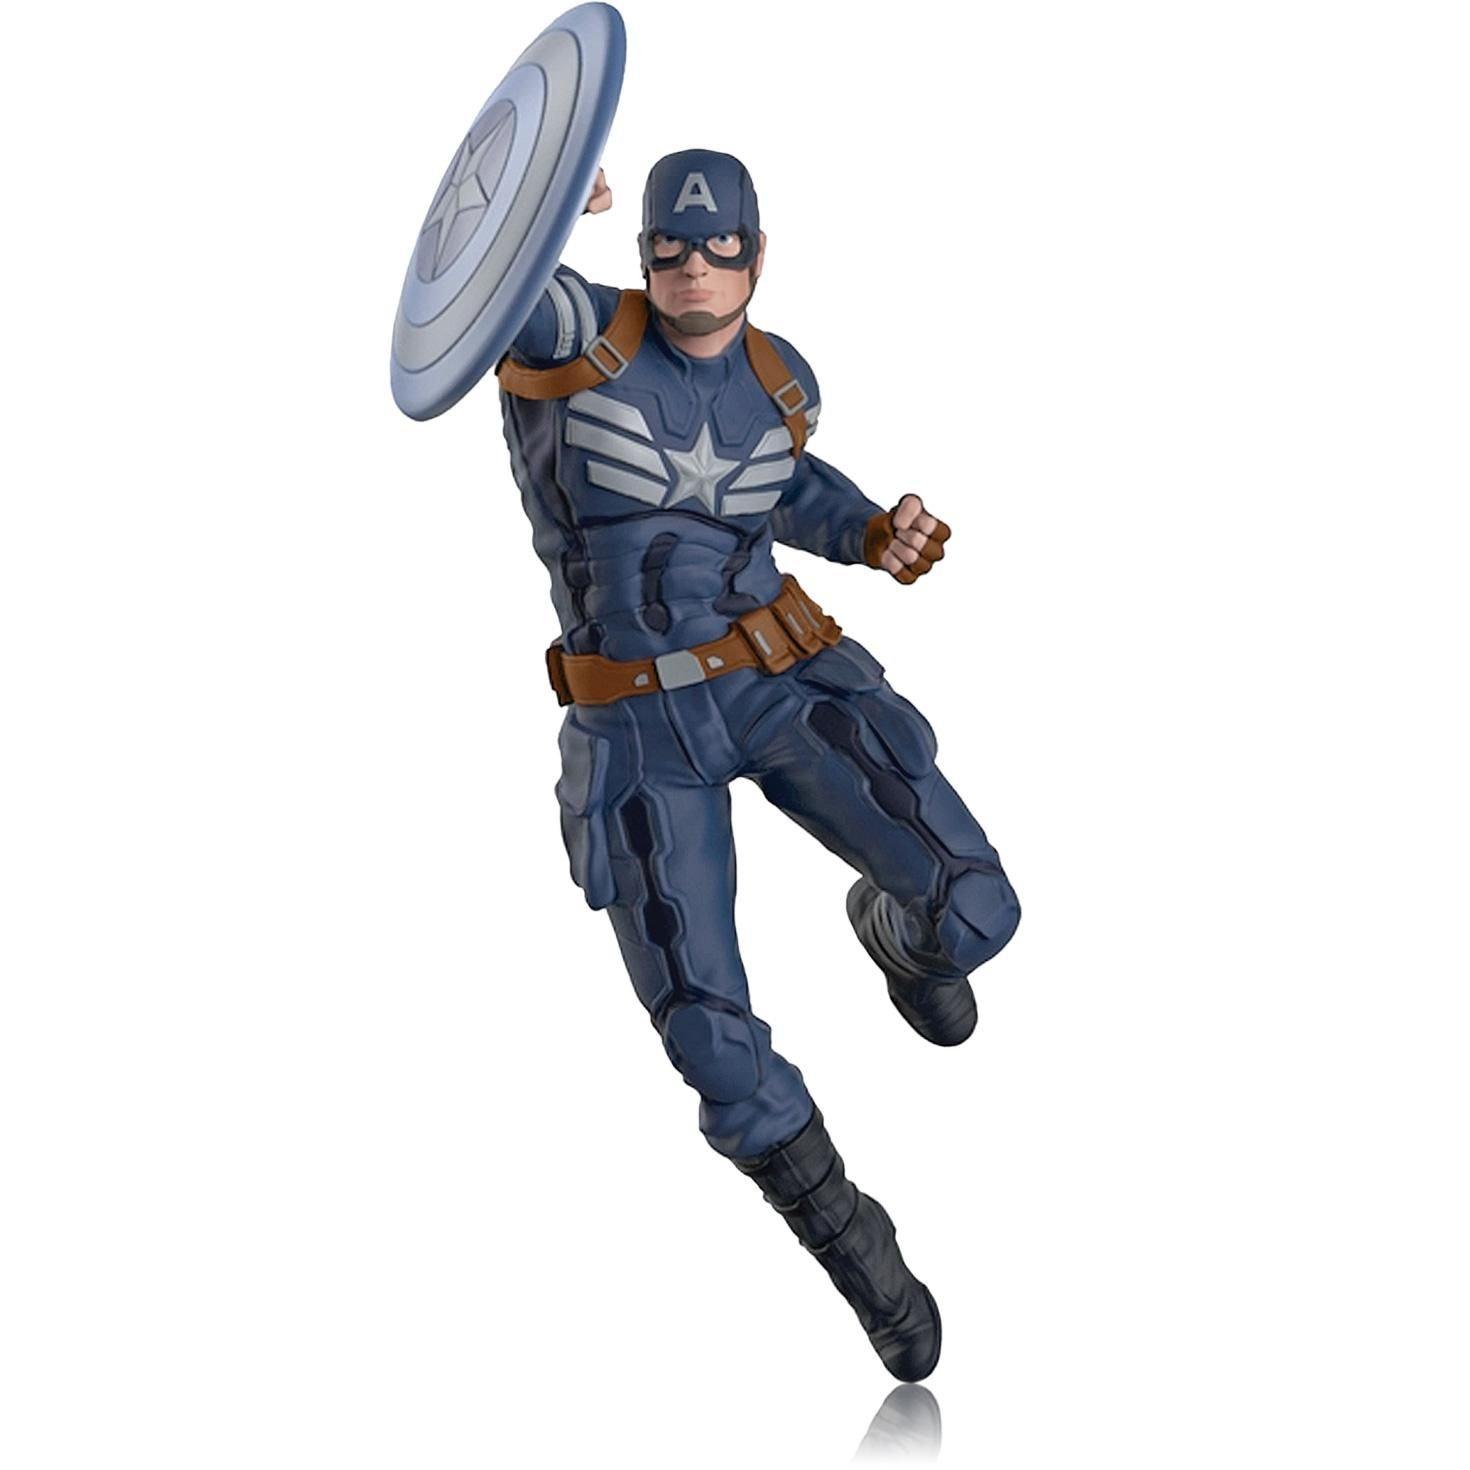 Captain America - The Winter Soldier - 2014 Hallmark Keepsake Ornament